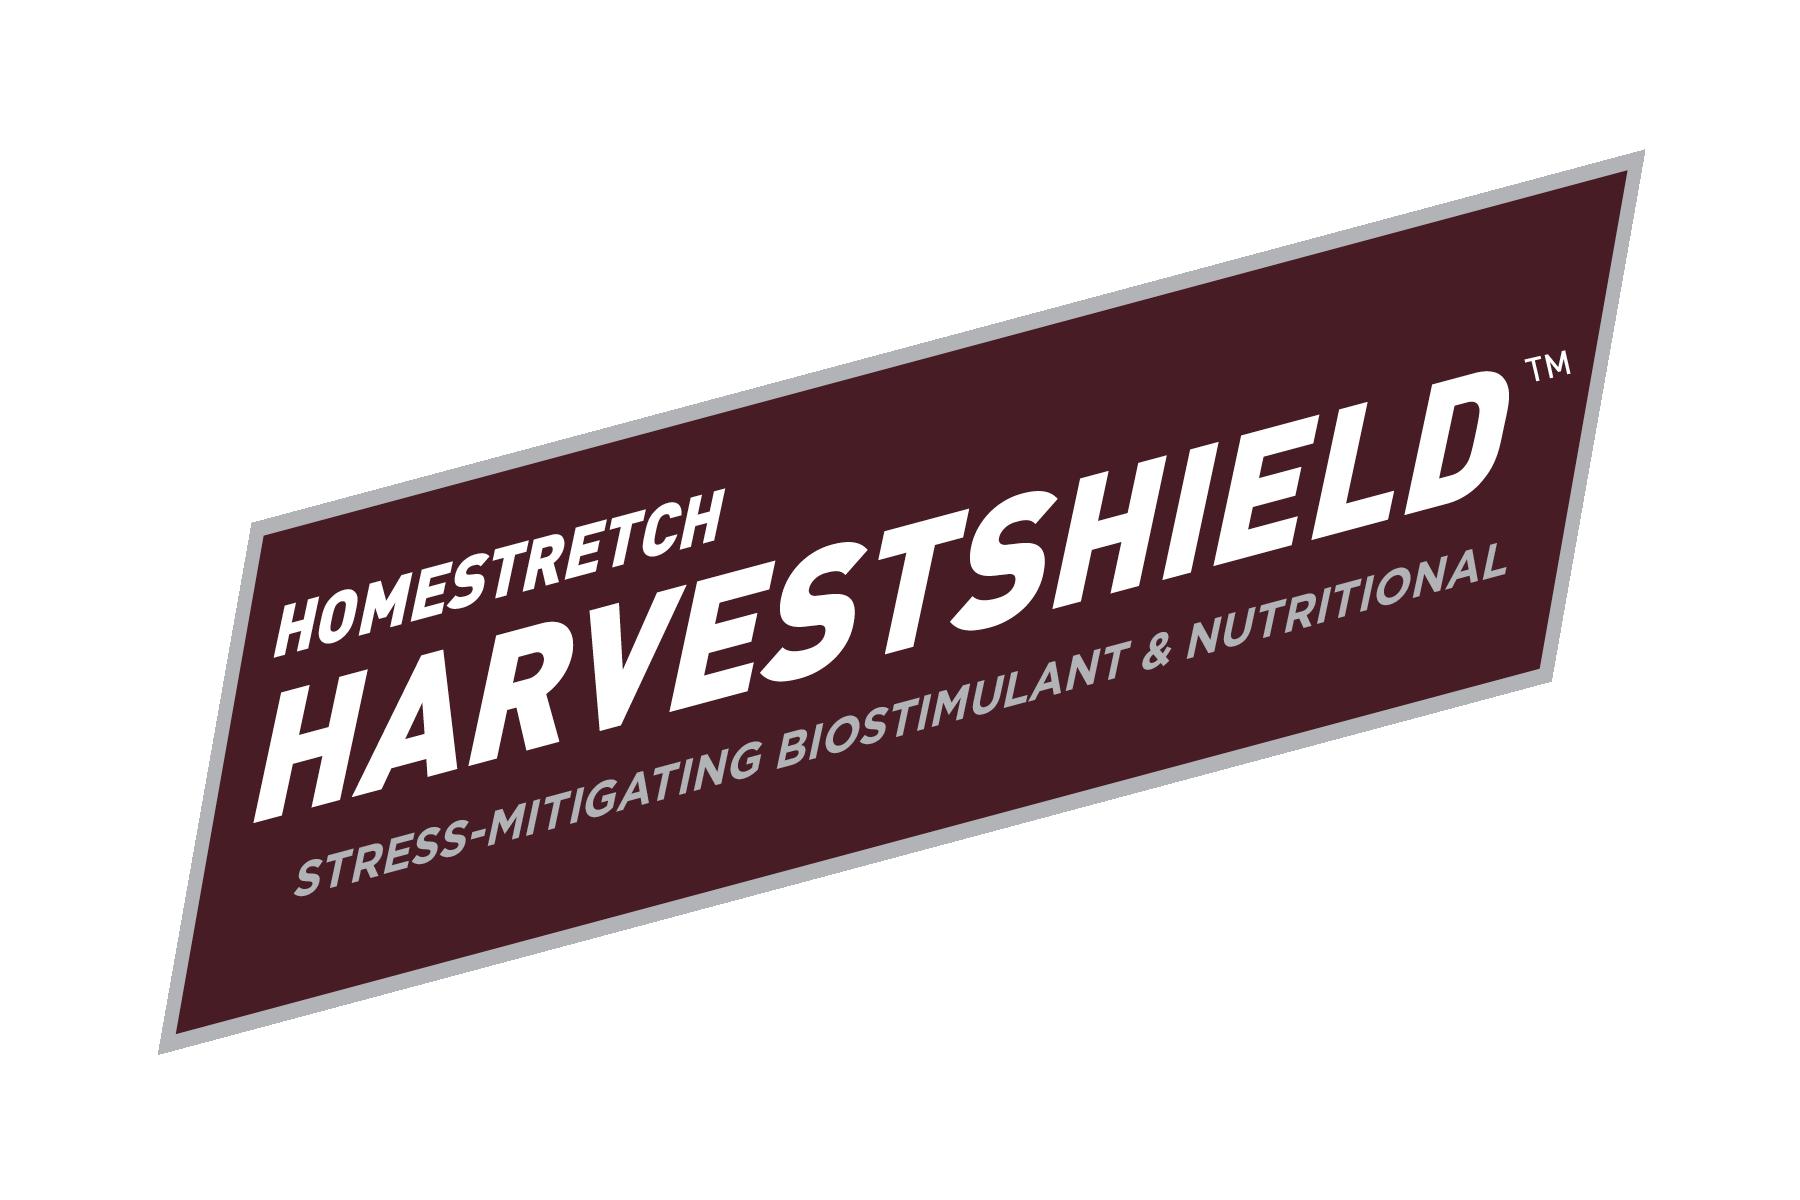 HOMESTRETCH HARVESTSHIELD™